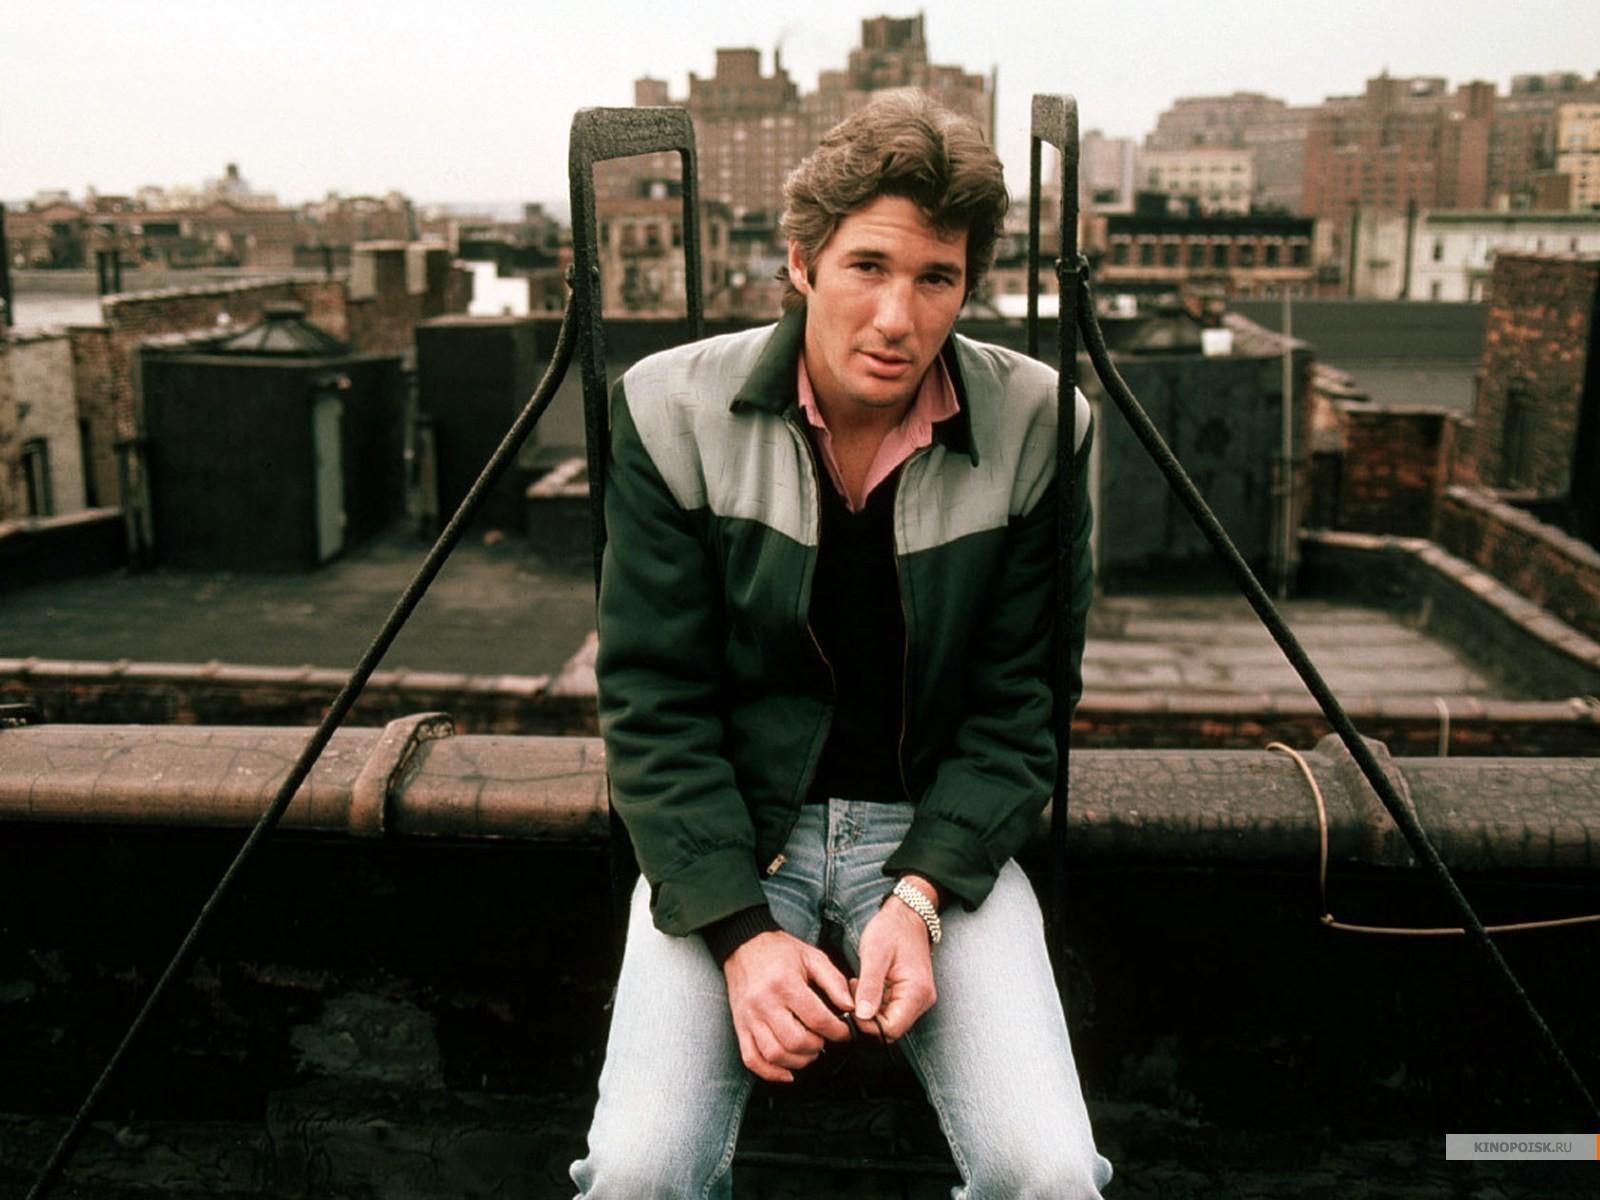 http://3.bp.blogspot.com/-aOnfovNbc78/UNVR-ho1eLI/AAAAAAAAoJY/gsUPzJiumAQ/s1600/Richard-Gere-in-jeans.jpg